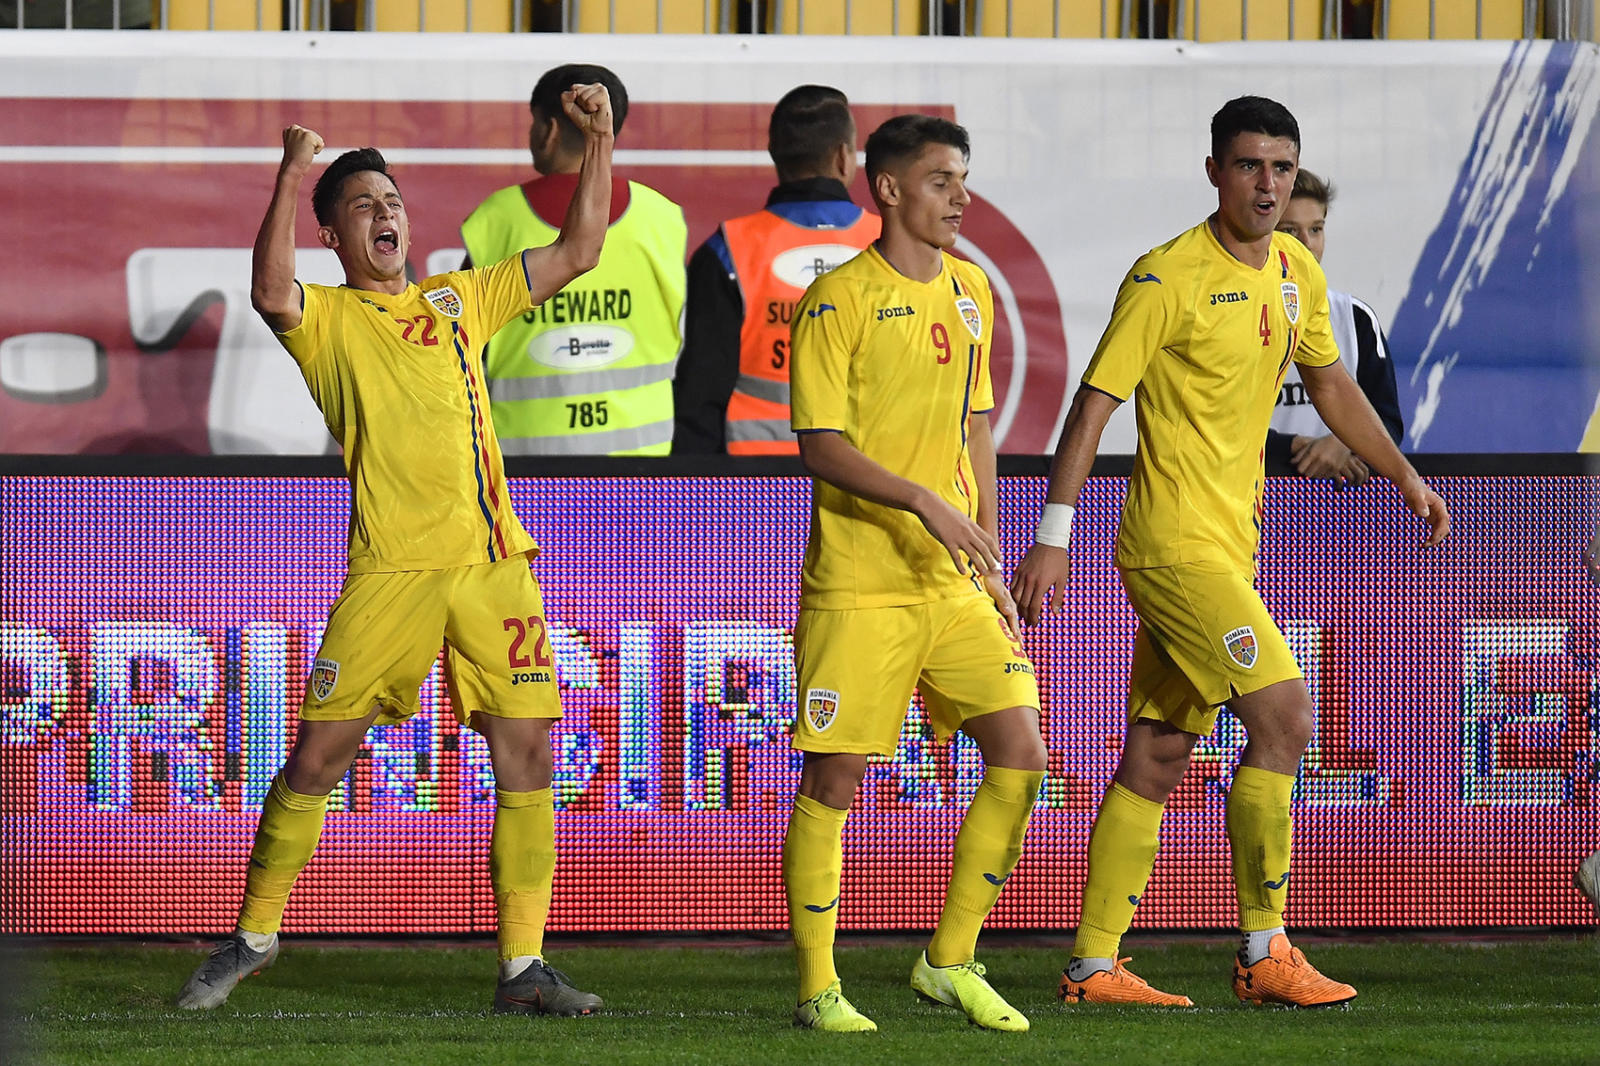 România - Irlanda de Nord, în preliminariile Euro U21, ora 20:30, live pe Pro TV